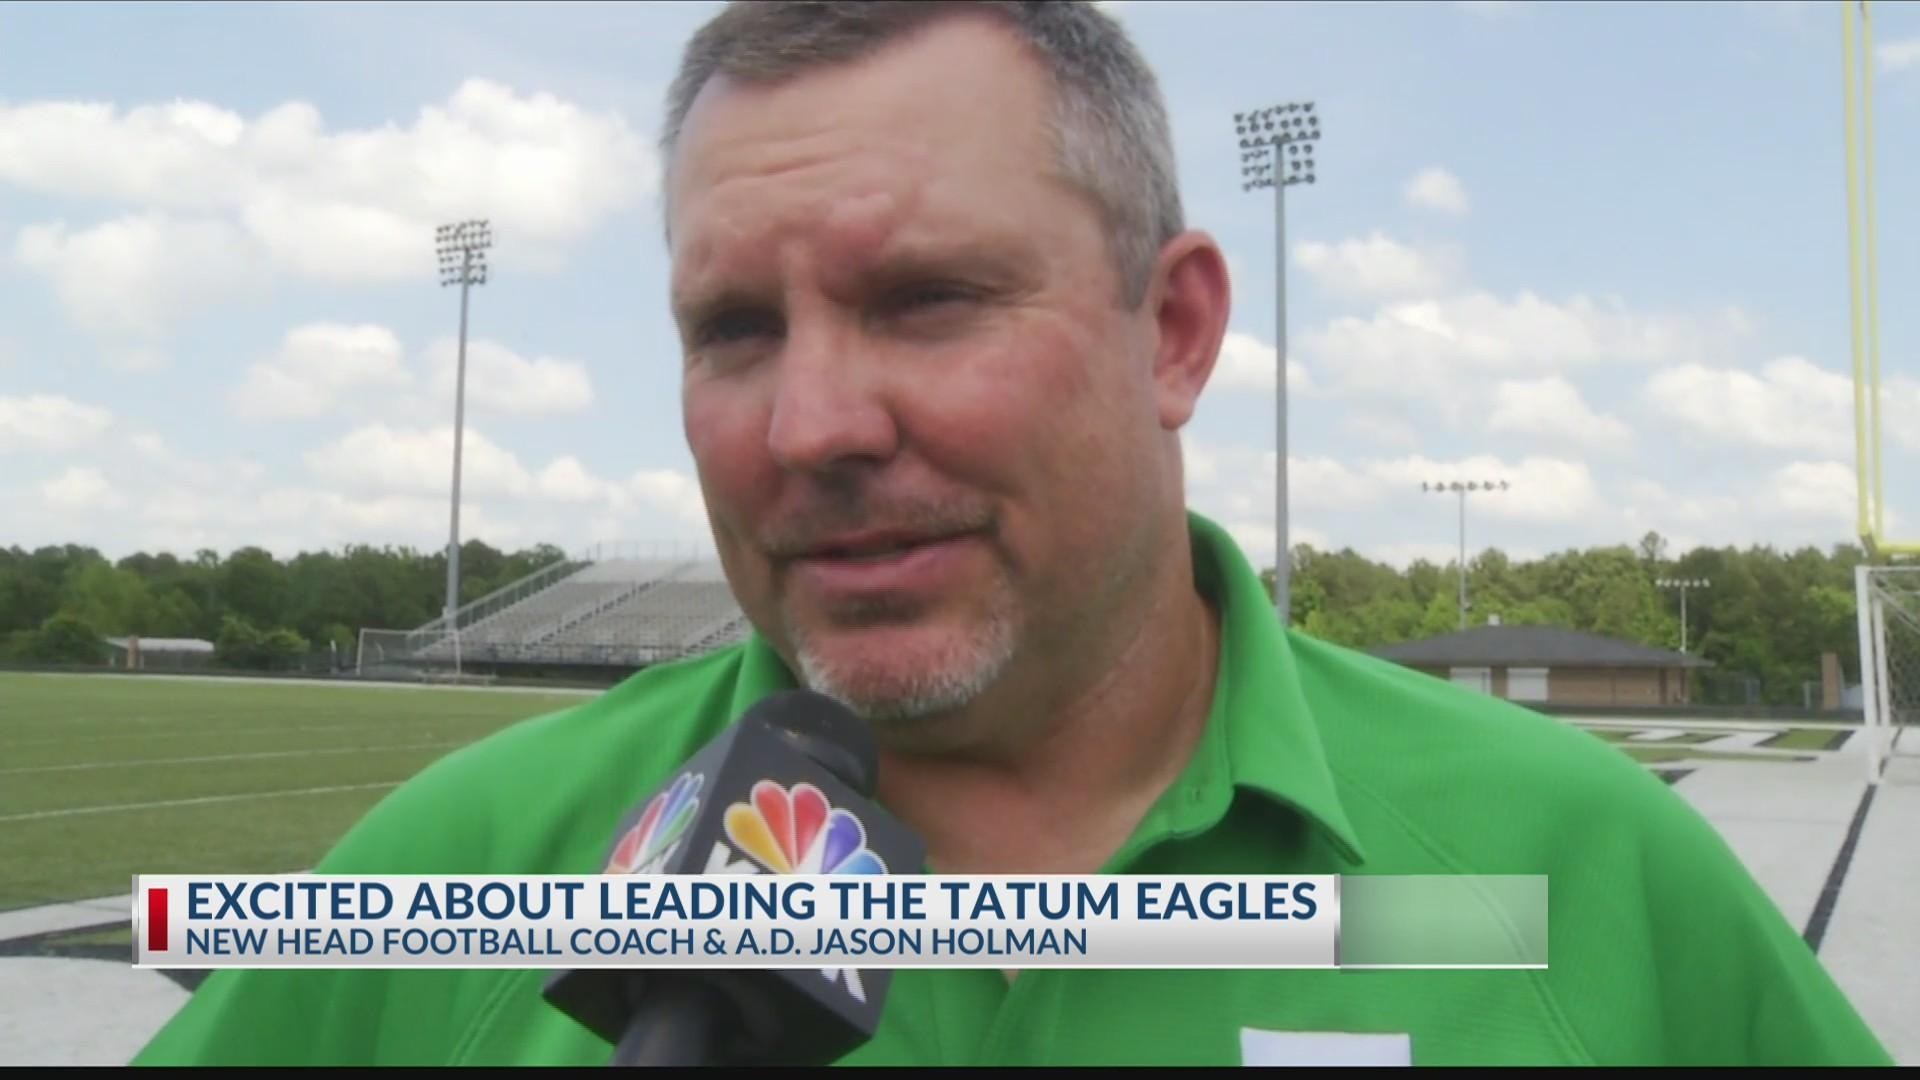 New_Tatum_football_coach_Jason_Holman_wa_0_20190508041701